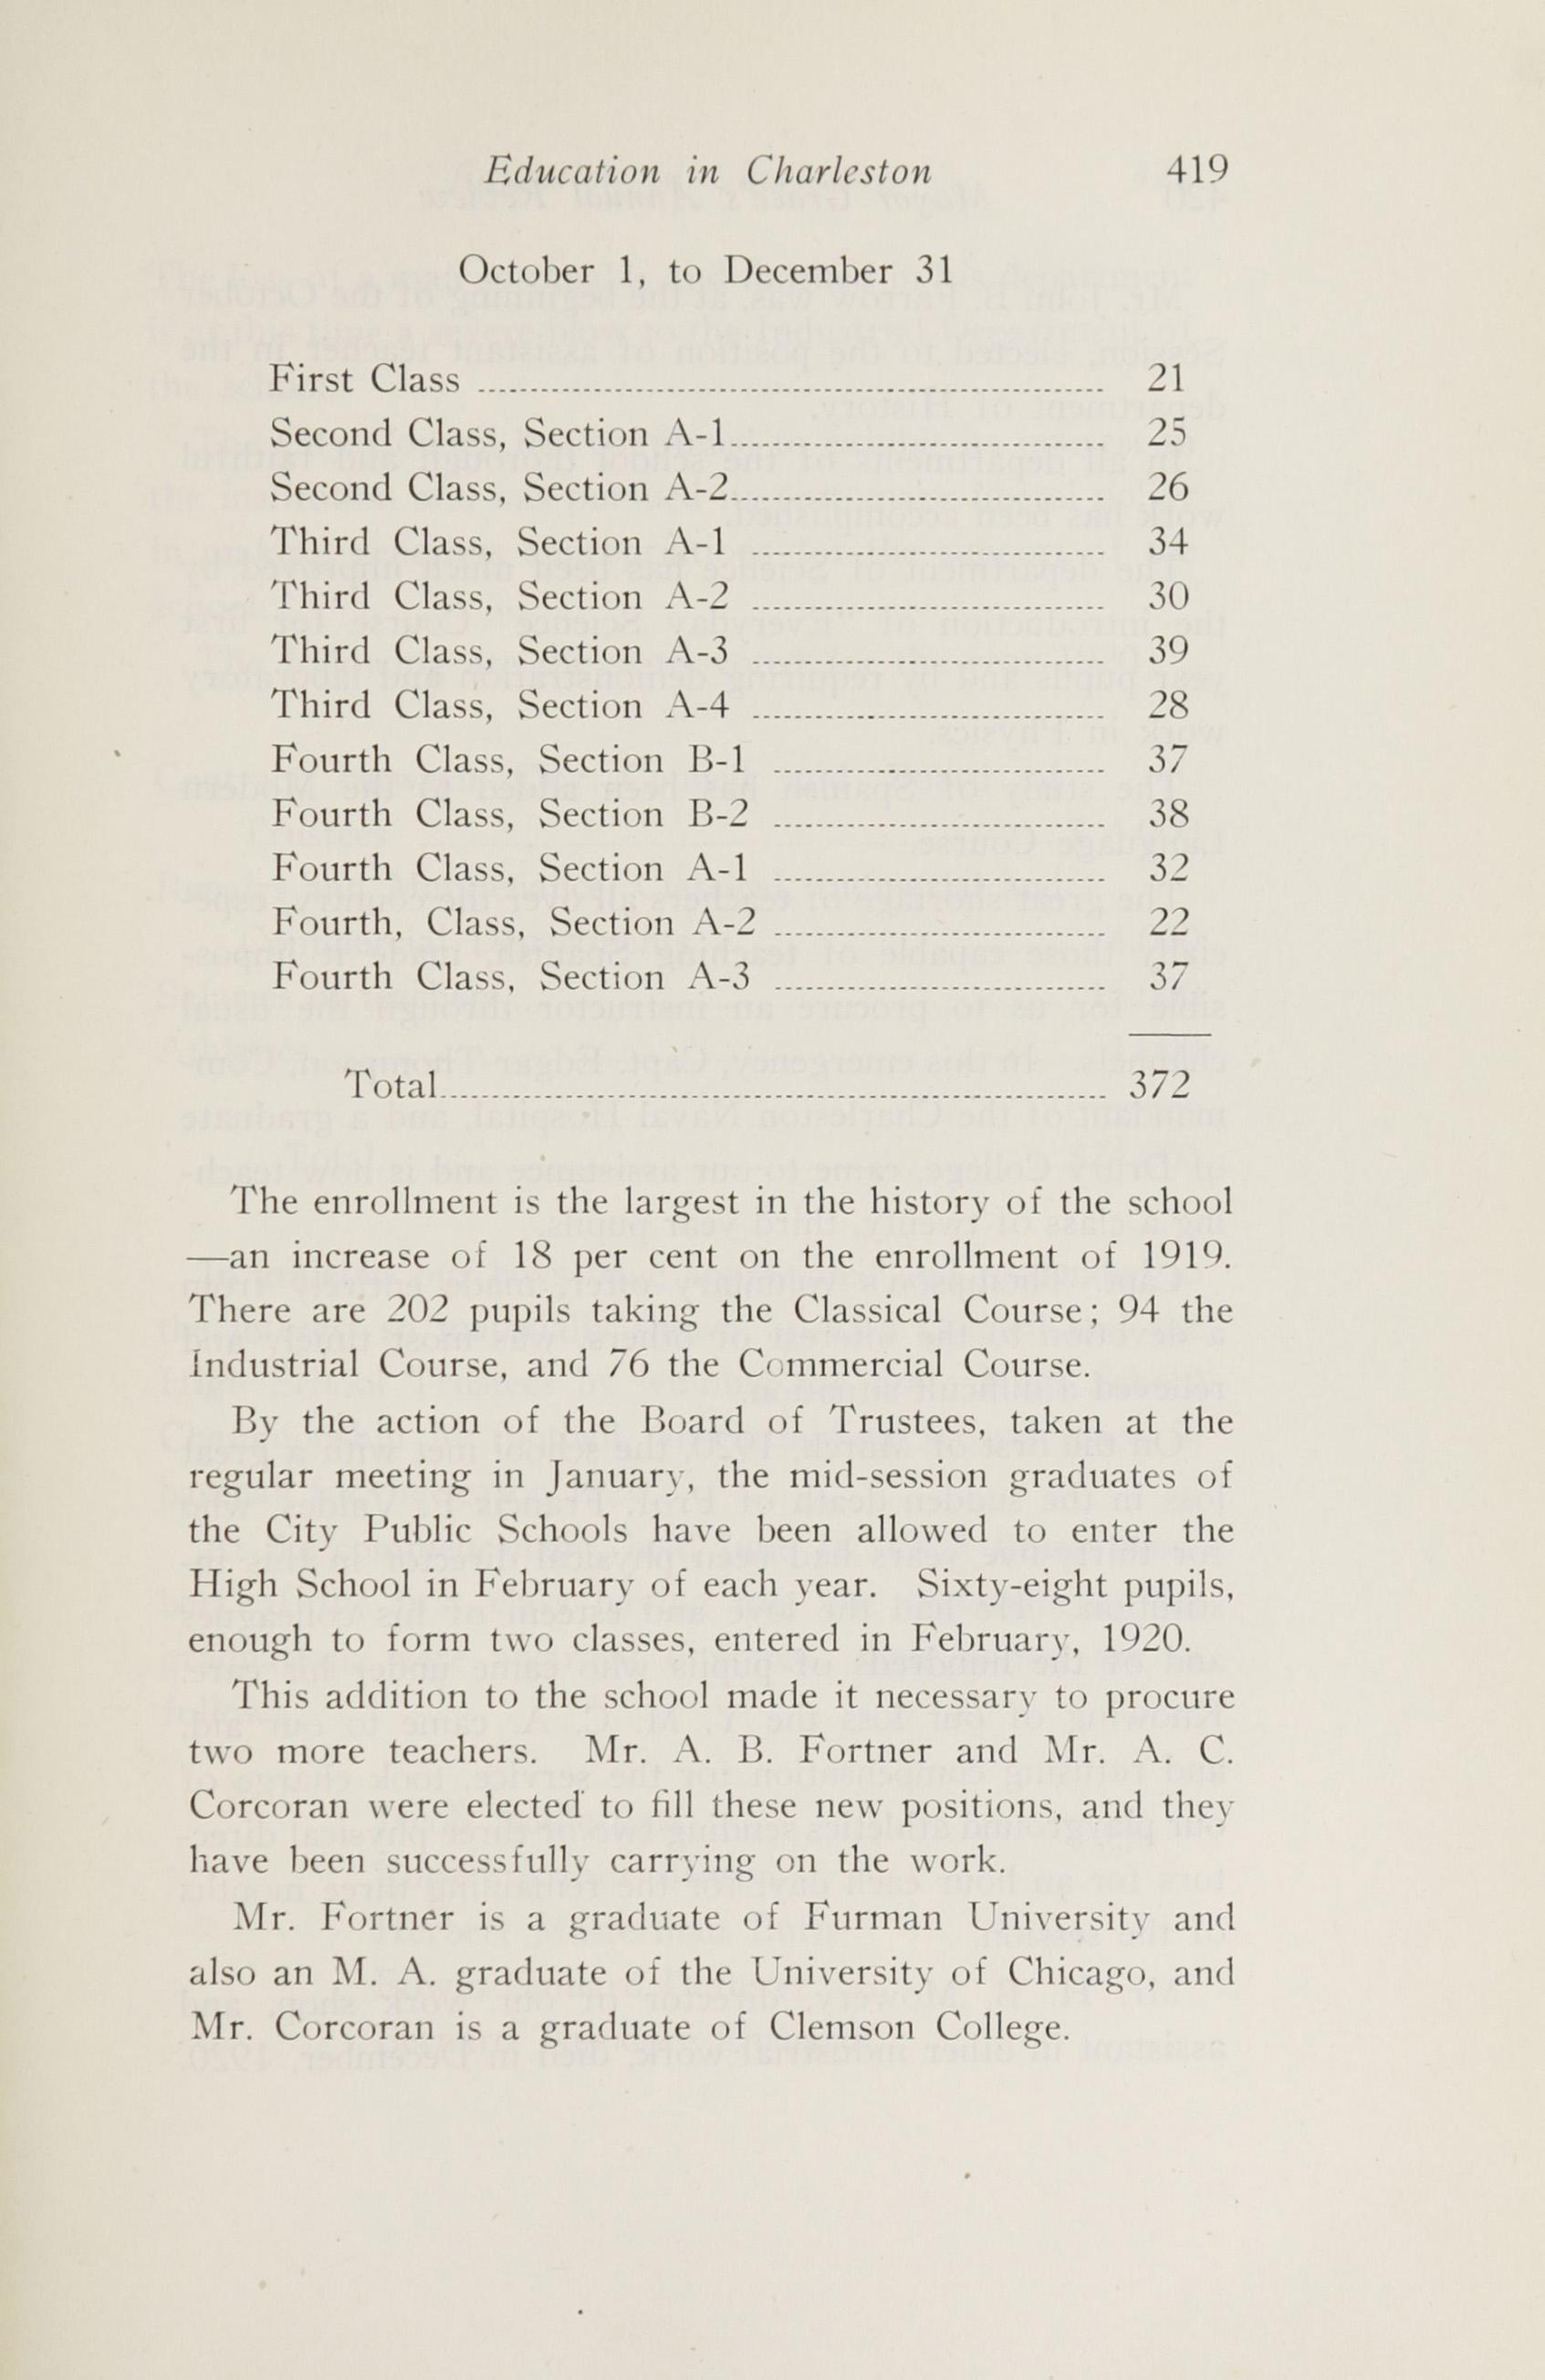 Charleston Yearbook, 1920, page 419